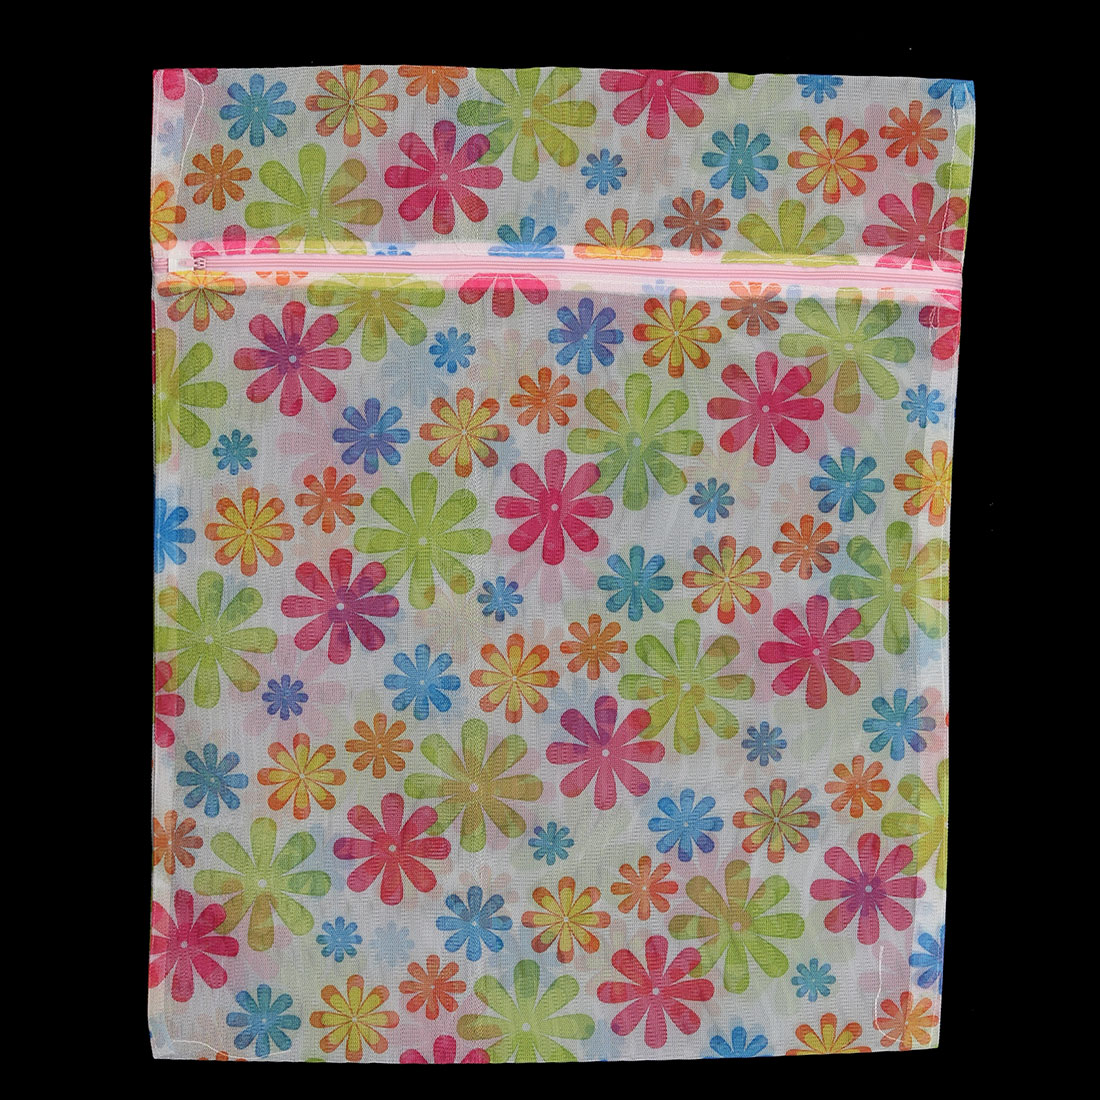 Home Laundry Chrysanthemum Pattern Garments Socks Underwear Mesh Zippered Washing Bag